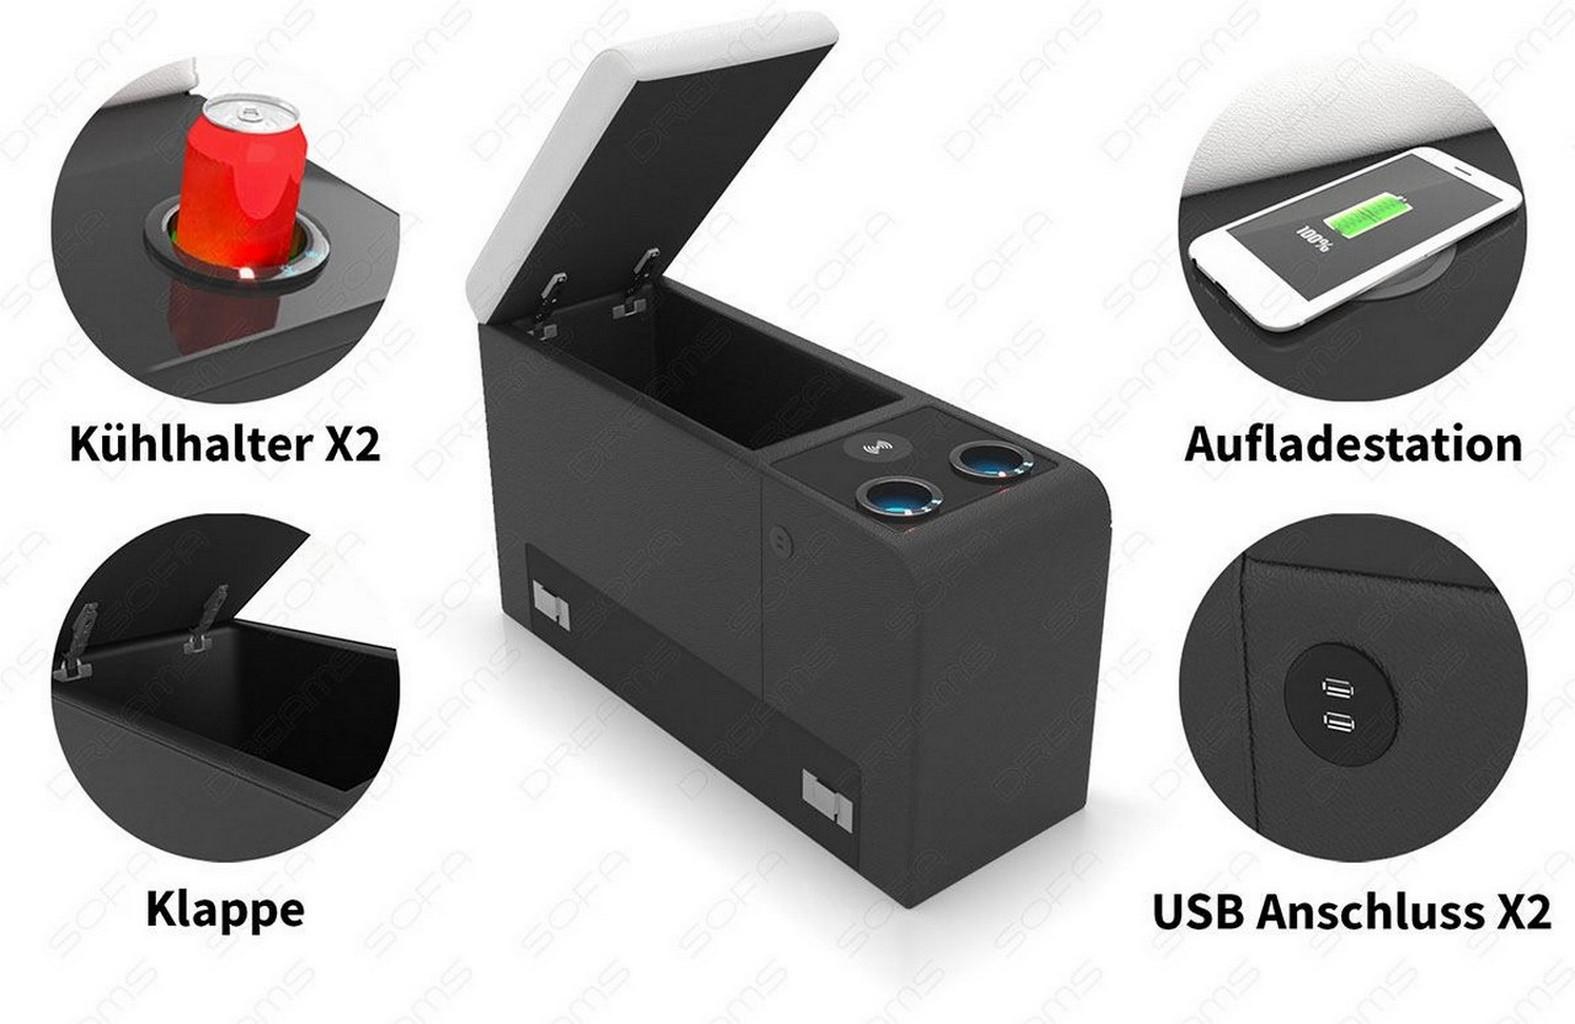 Mini Kühlschrank Mit Usb Anschluss : Zusatzelement für sofadreams sofas kühlschrank kühlende